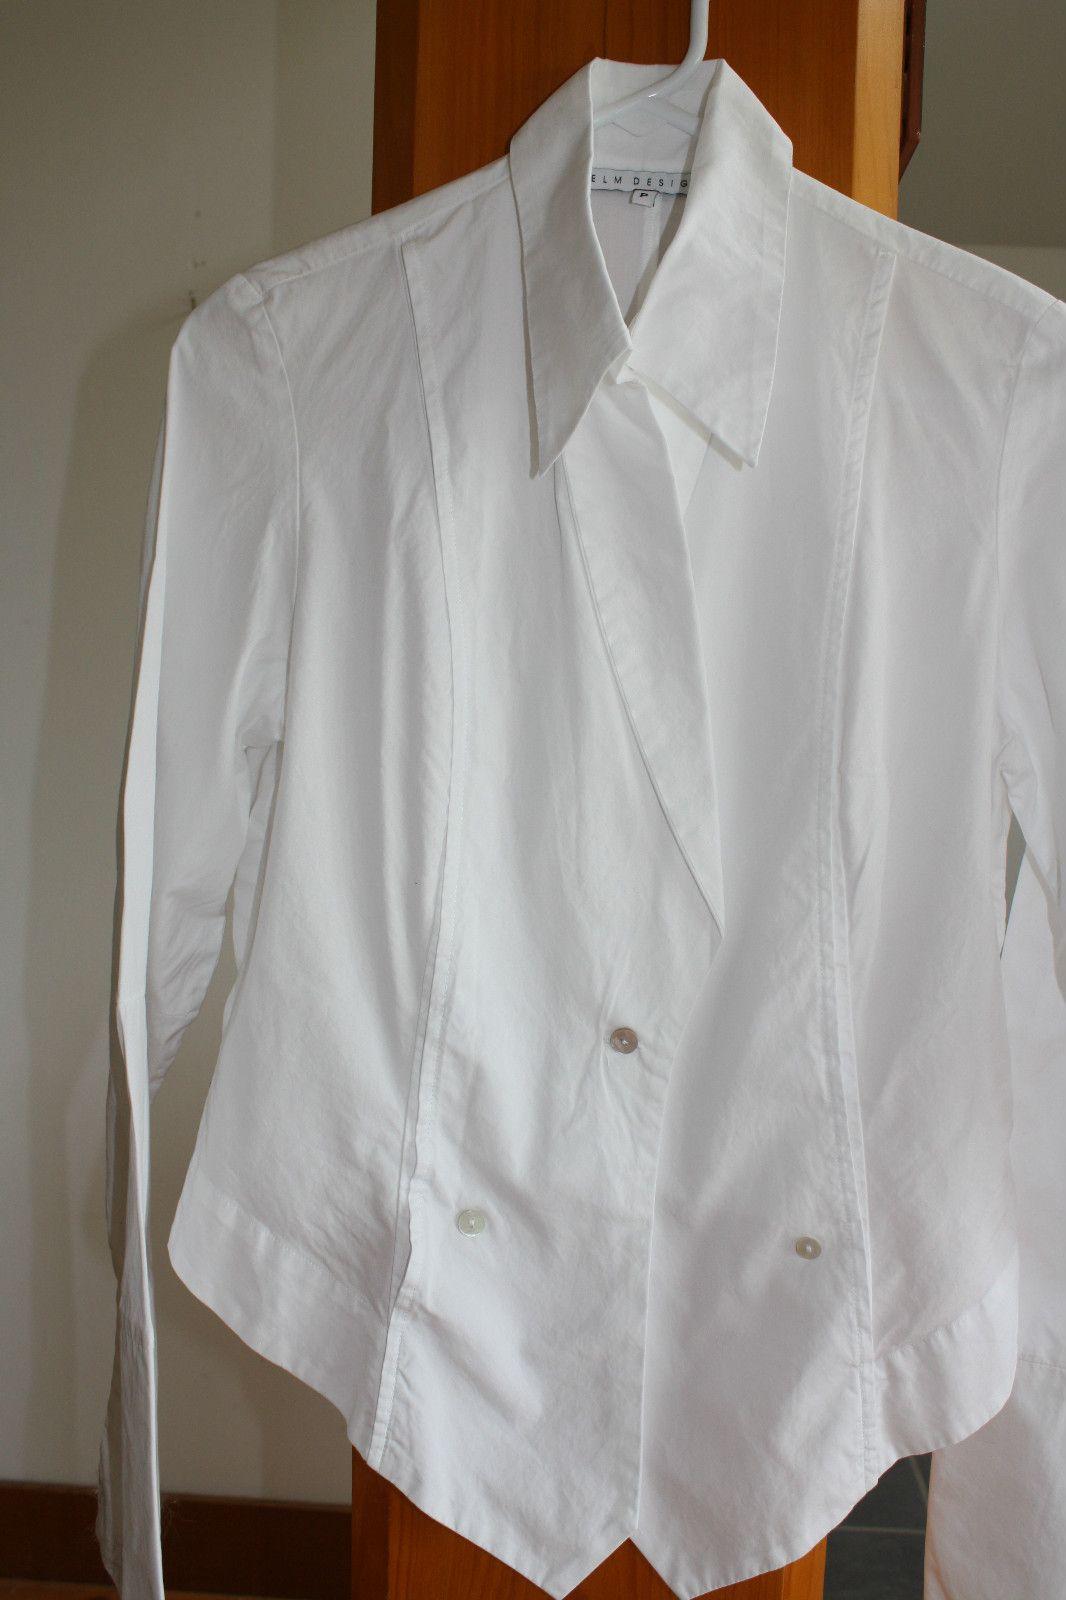 Unusual Elm Design Perfect White Cotton Shirt Woptional Tuxedo